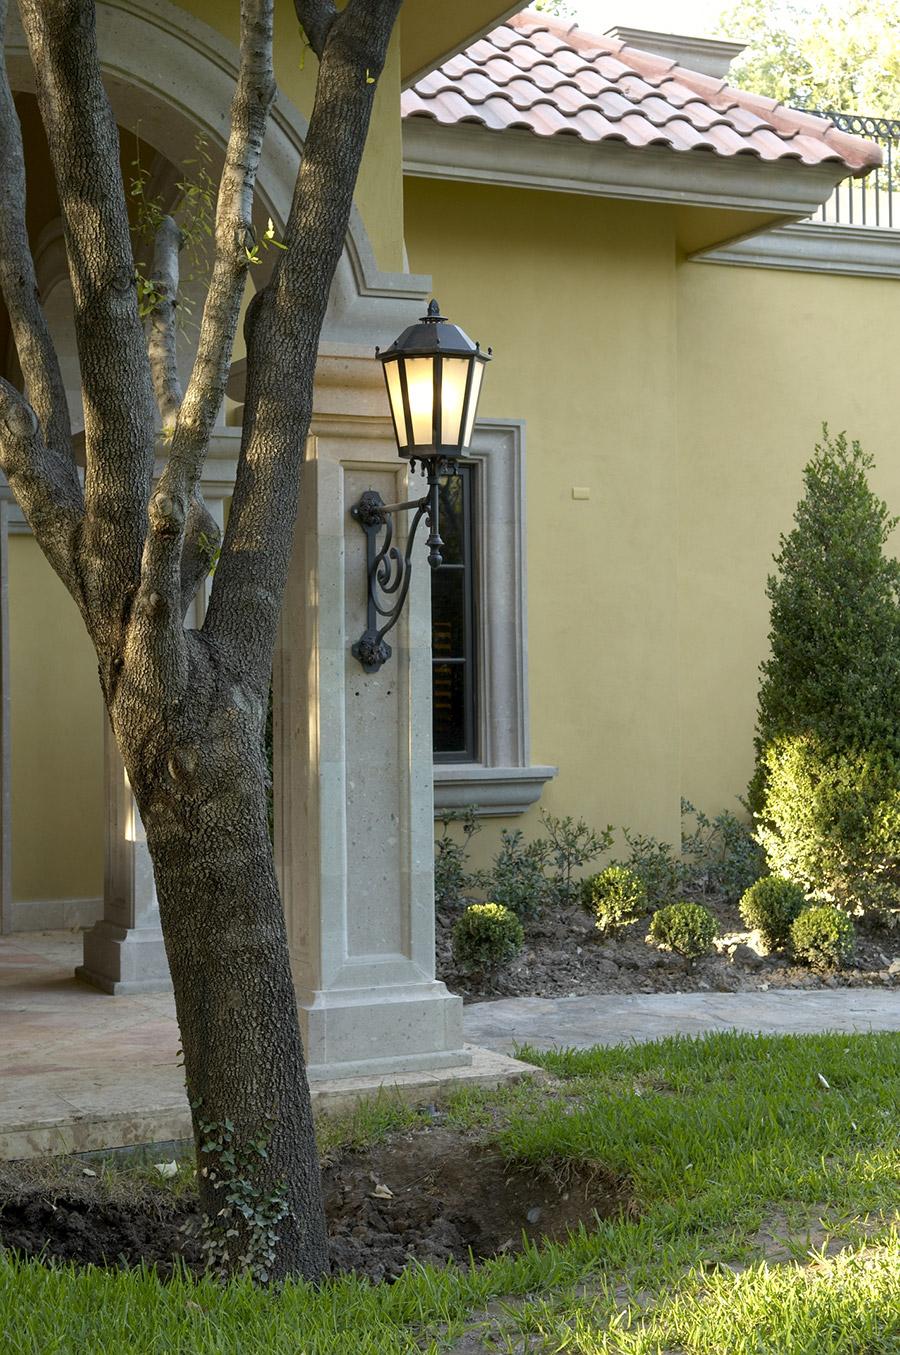 Sicilia-OLS-CLA-E-004-classic-outdoor-Steel-Lighting-Santa-Barbara-Residence-(2)